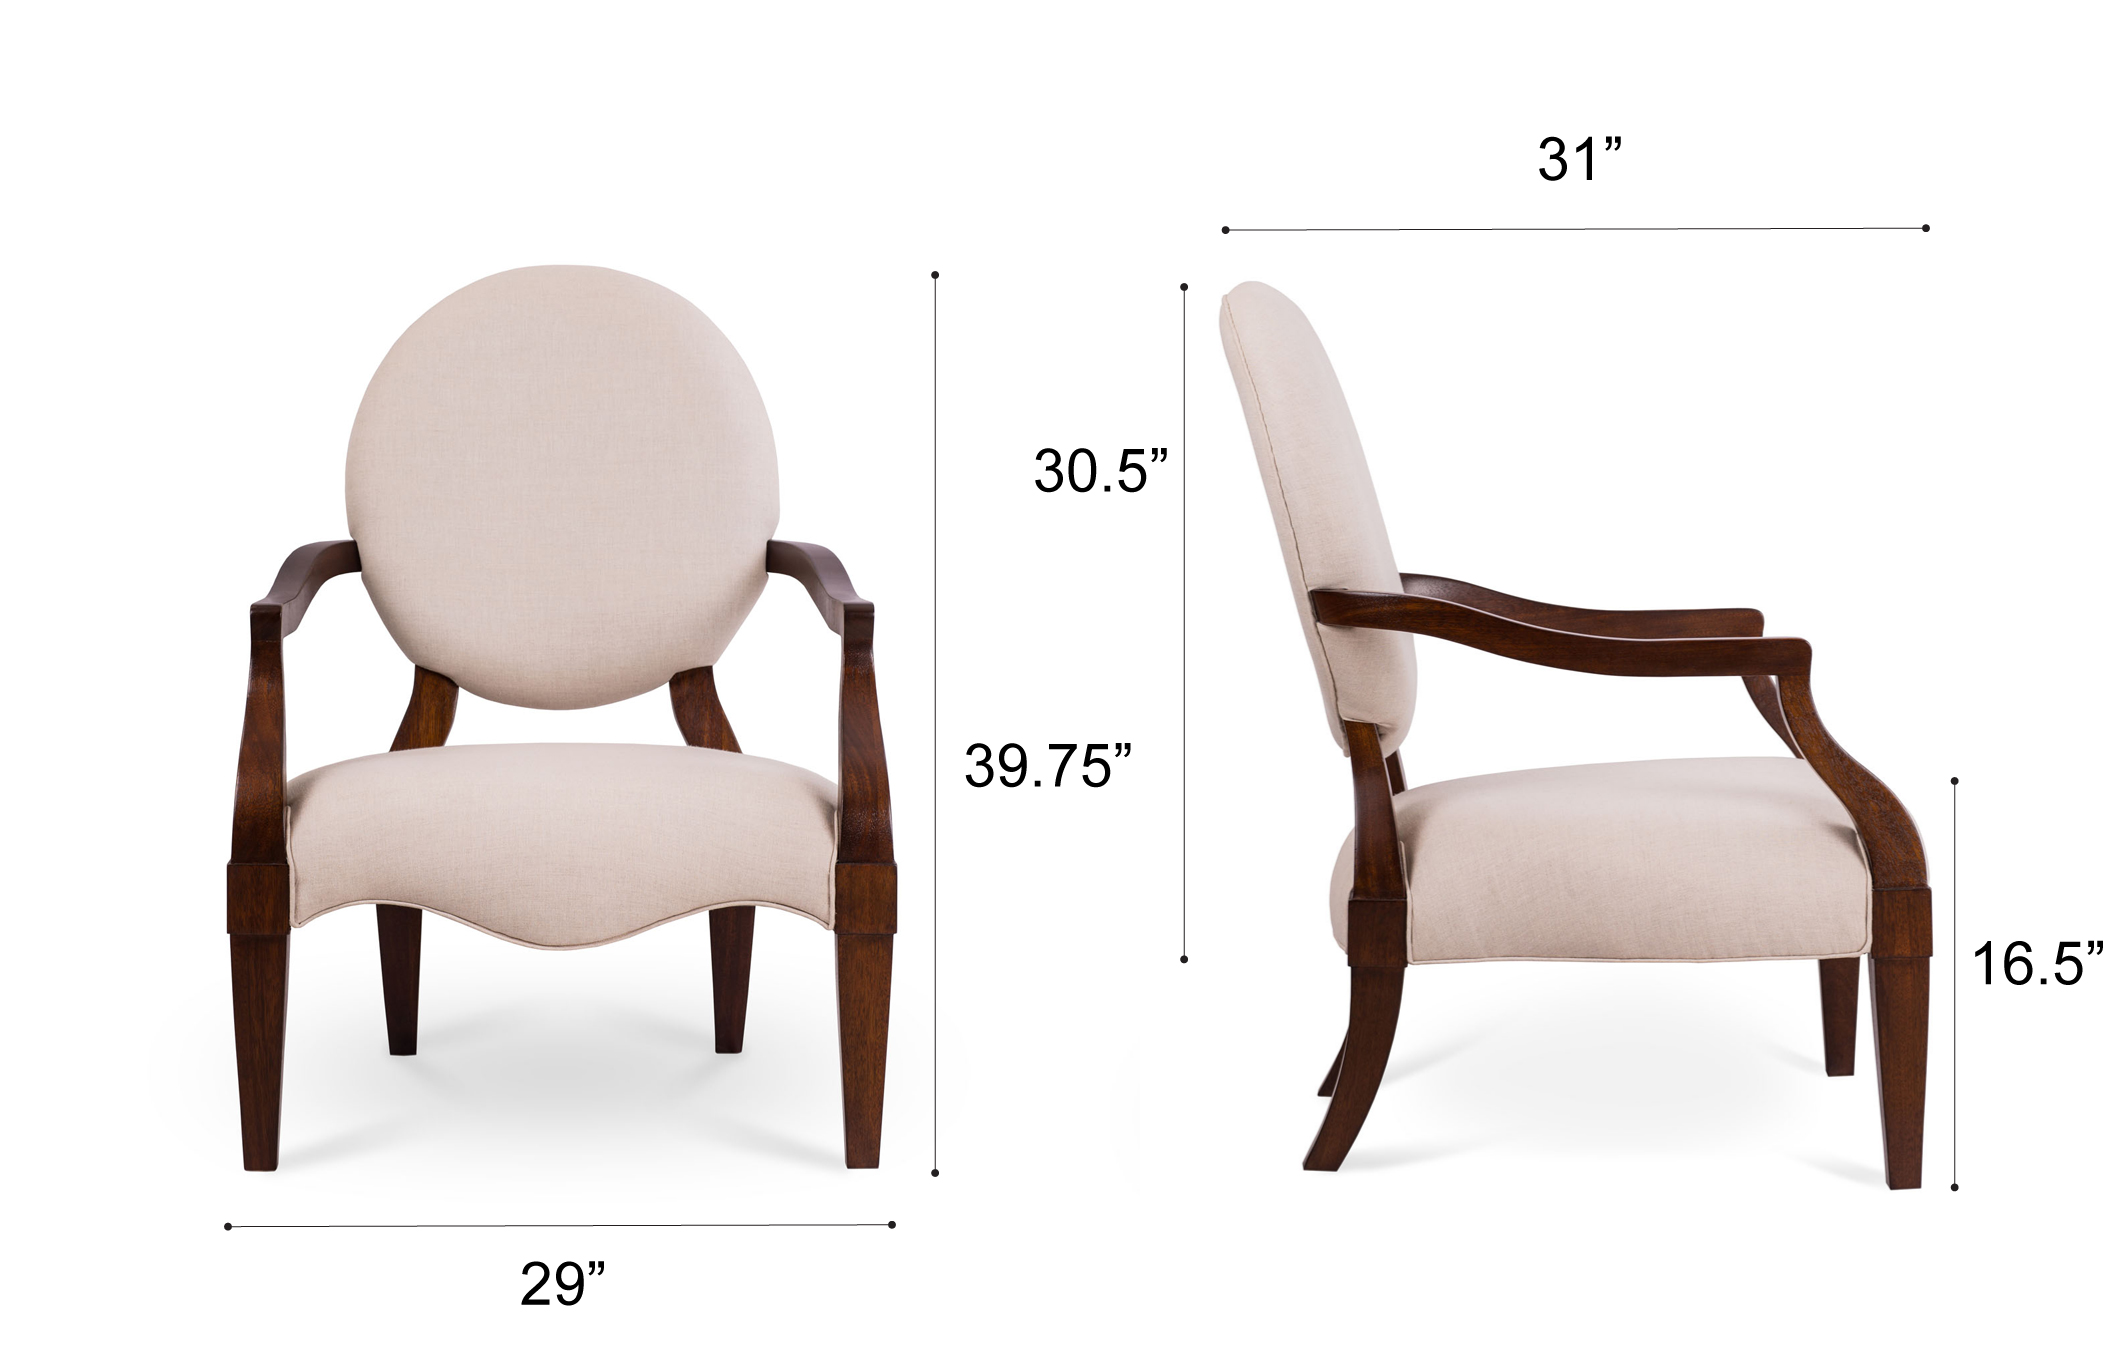 Dowel Furniture Bea Armchair Dimensions